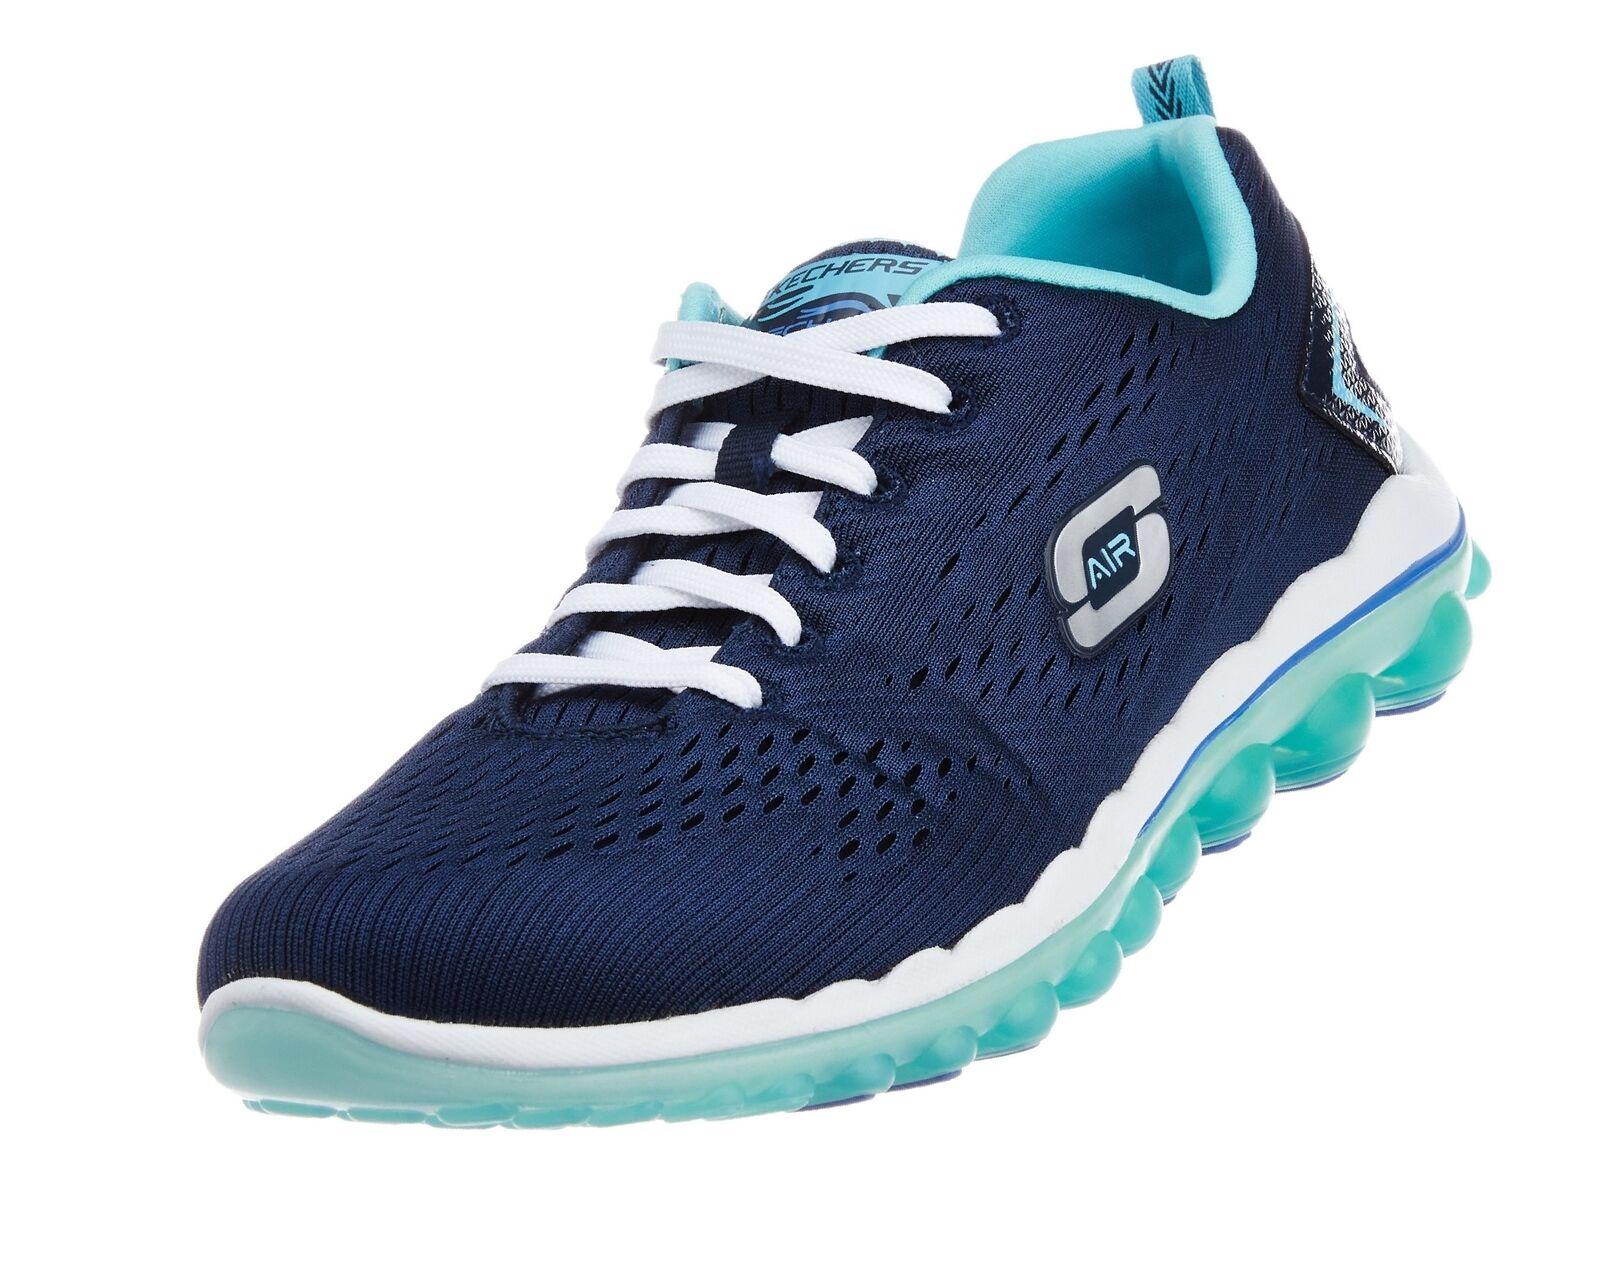 Skechers Sport Women's Skech Air Run High Fashion Sneaker 10 B(M) US New